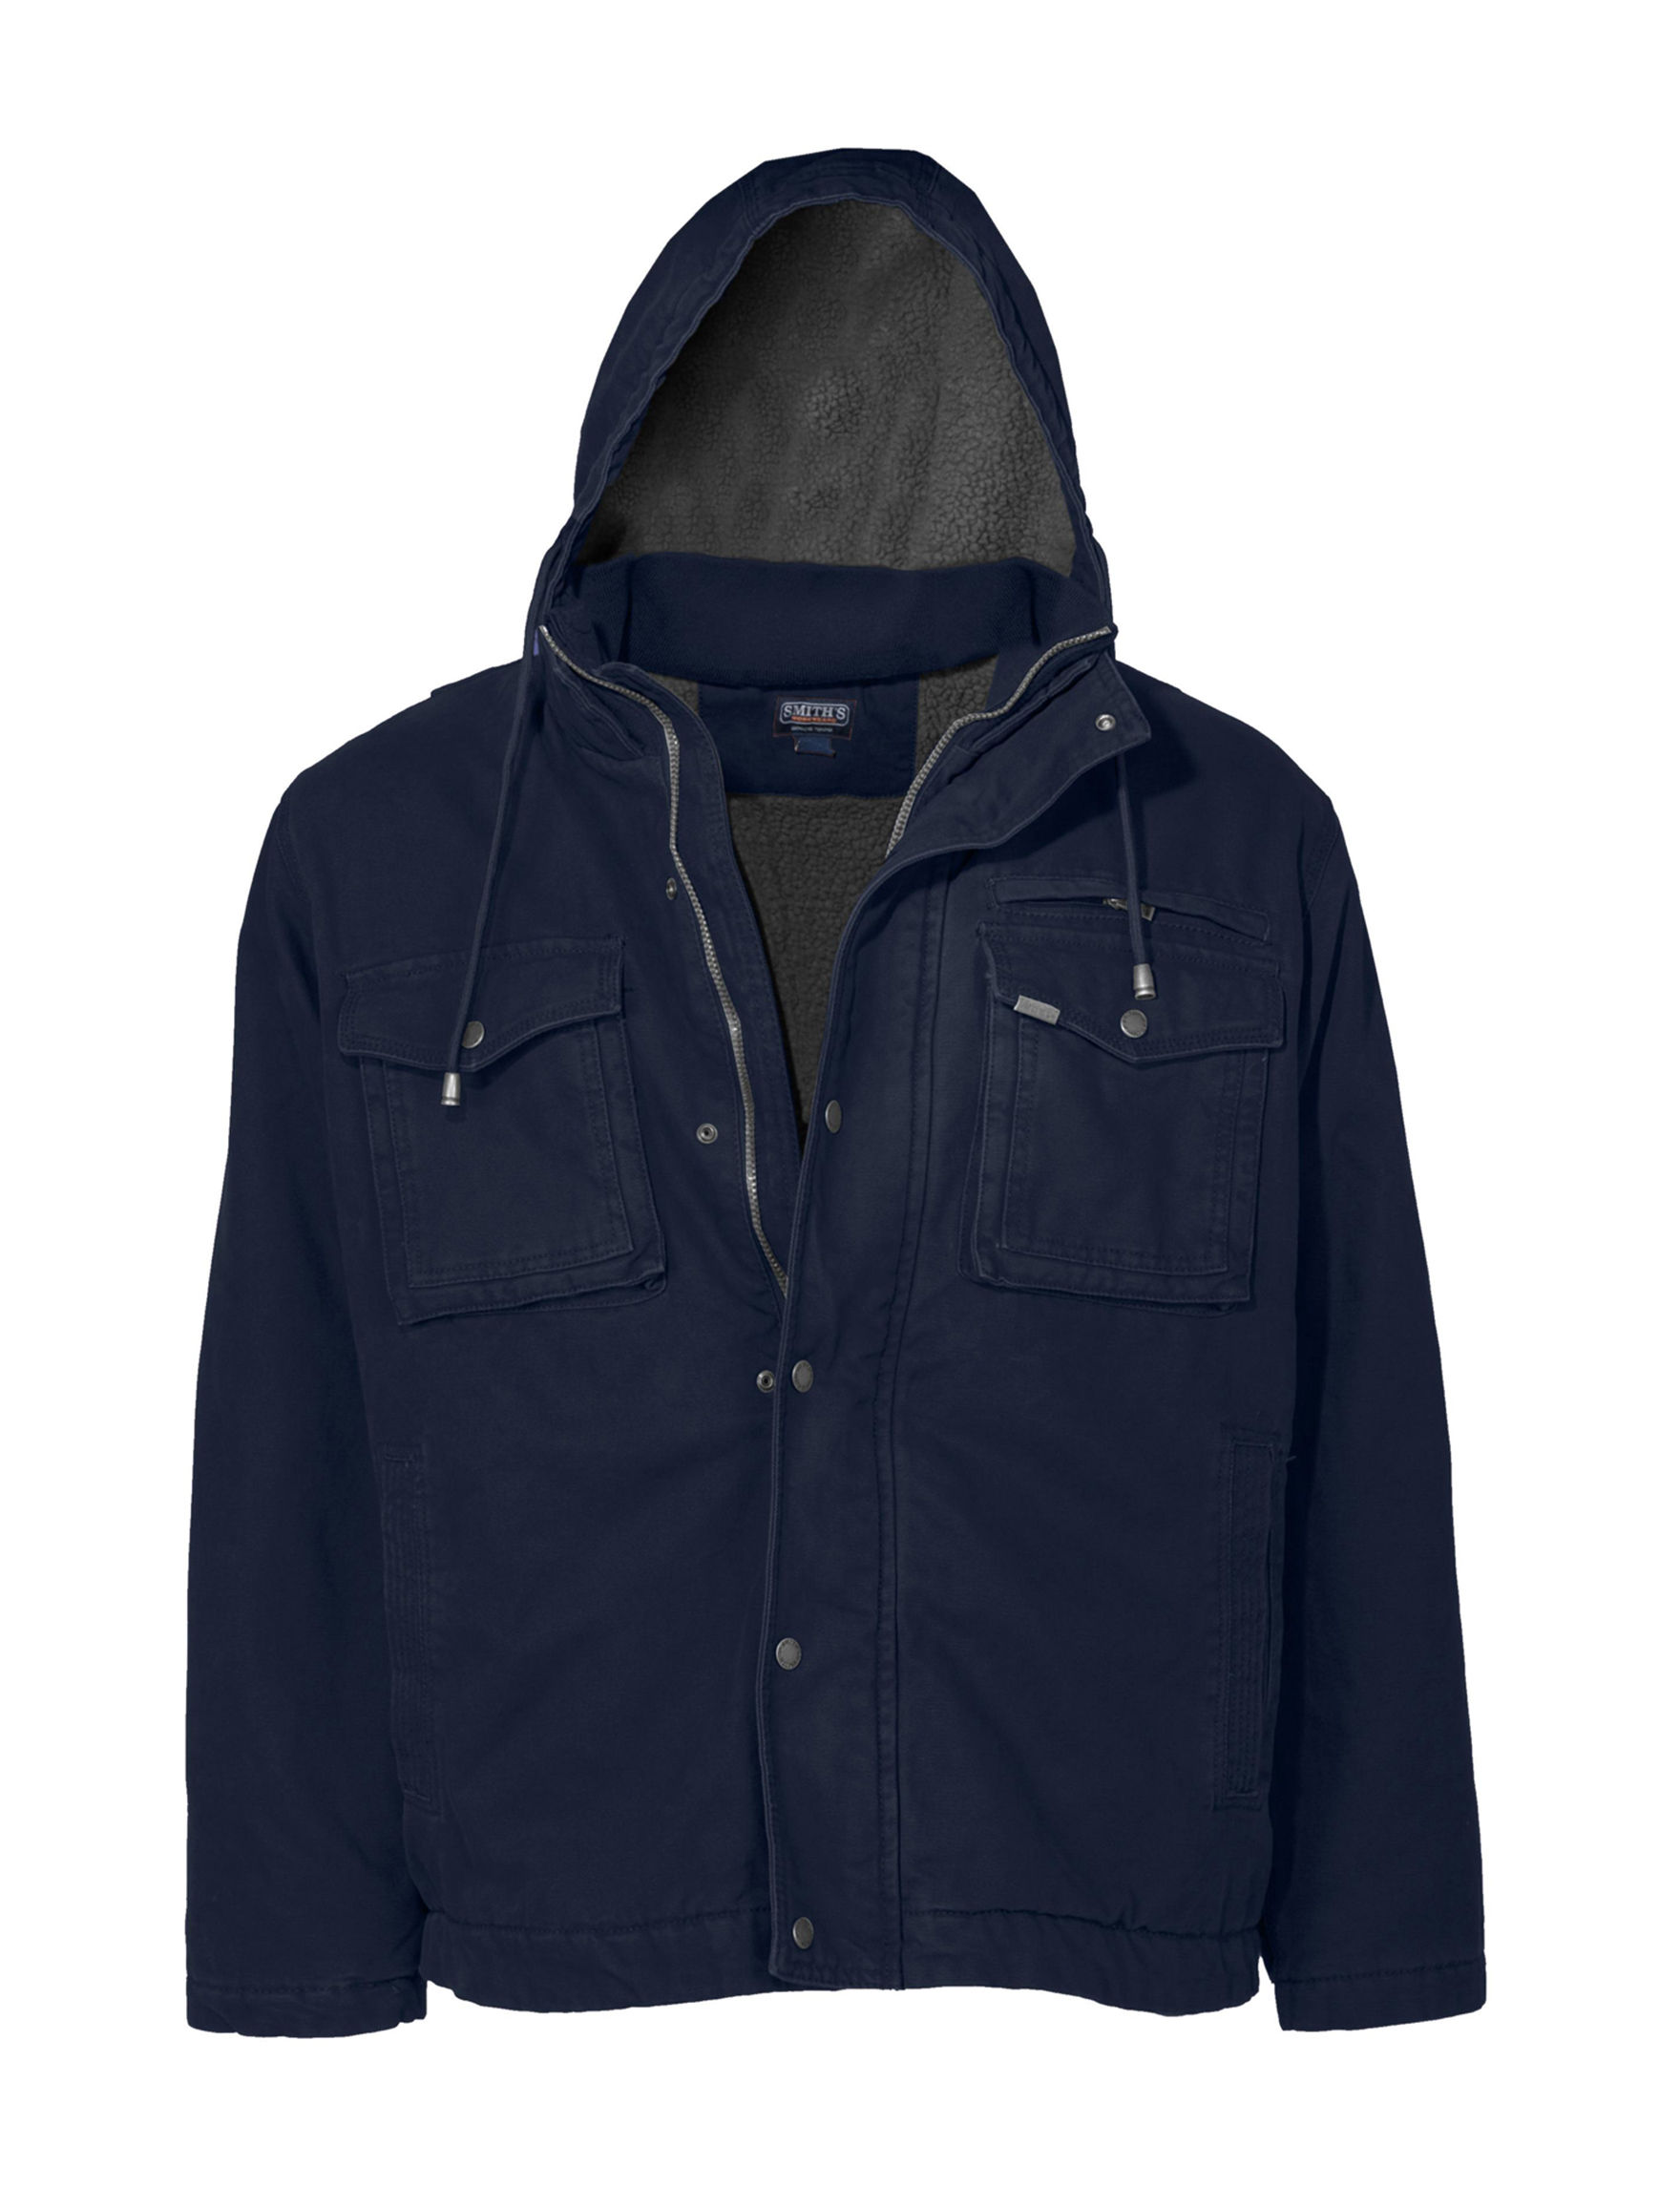 Smith's Workwear Dark Blue Insulated Jackets